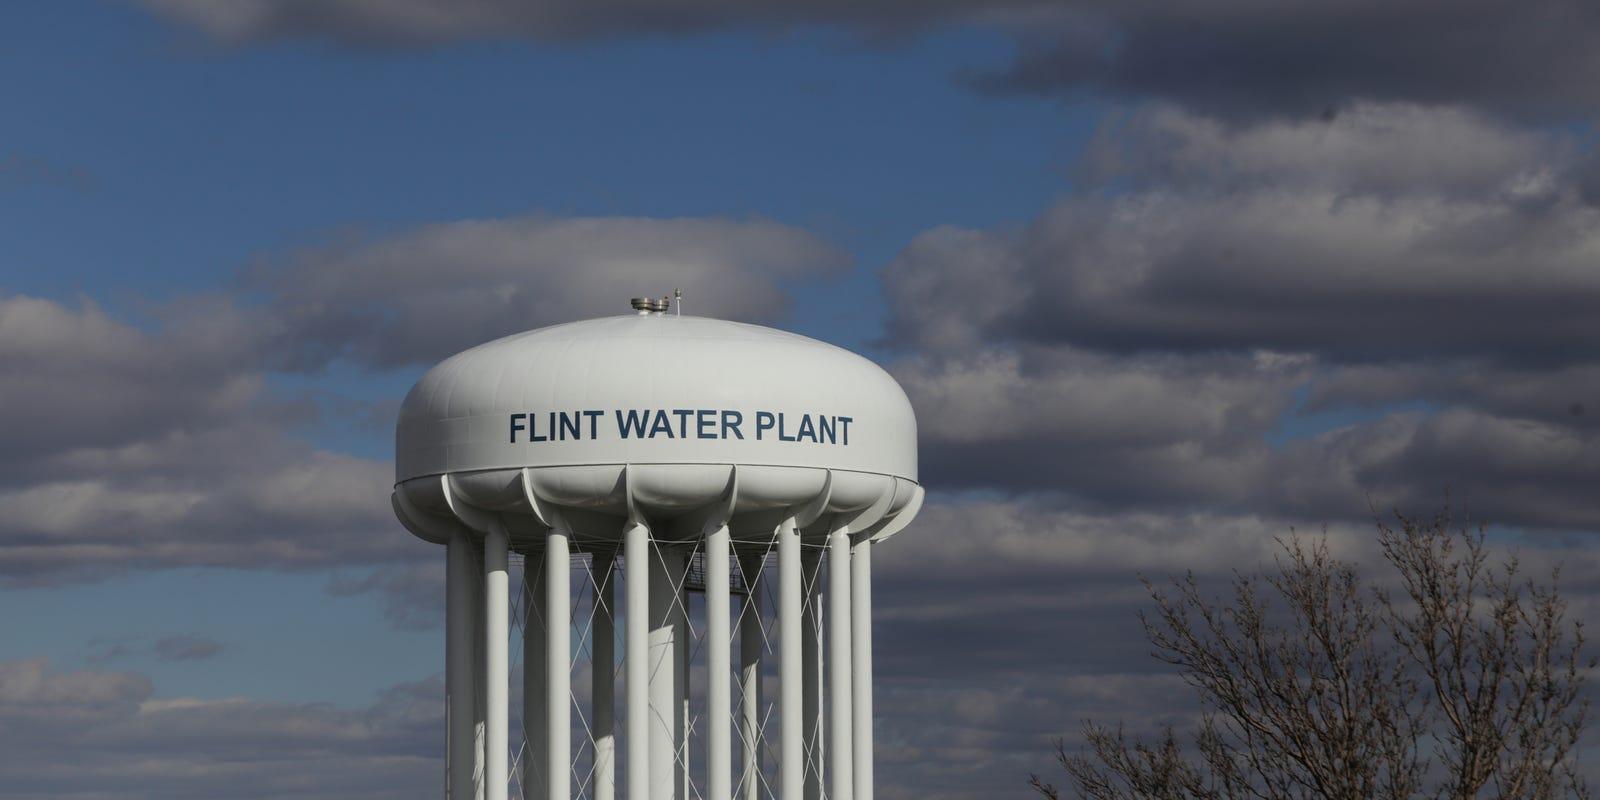 Lawsuit alleges Flint water crisis hit jail inmates